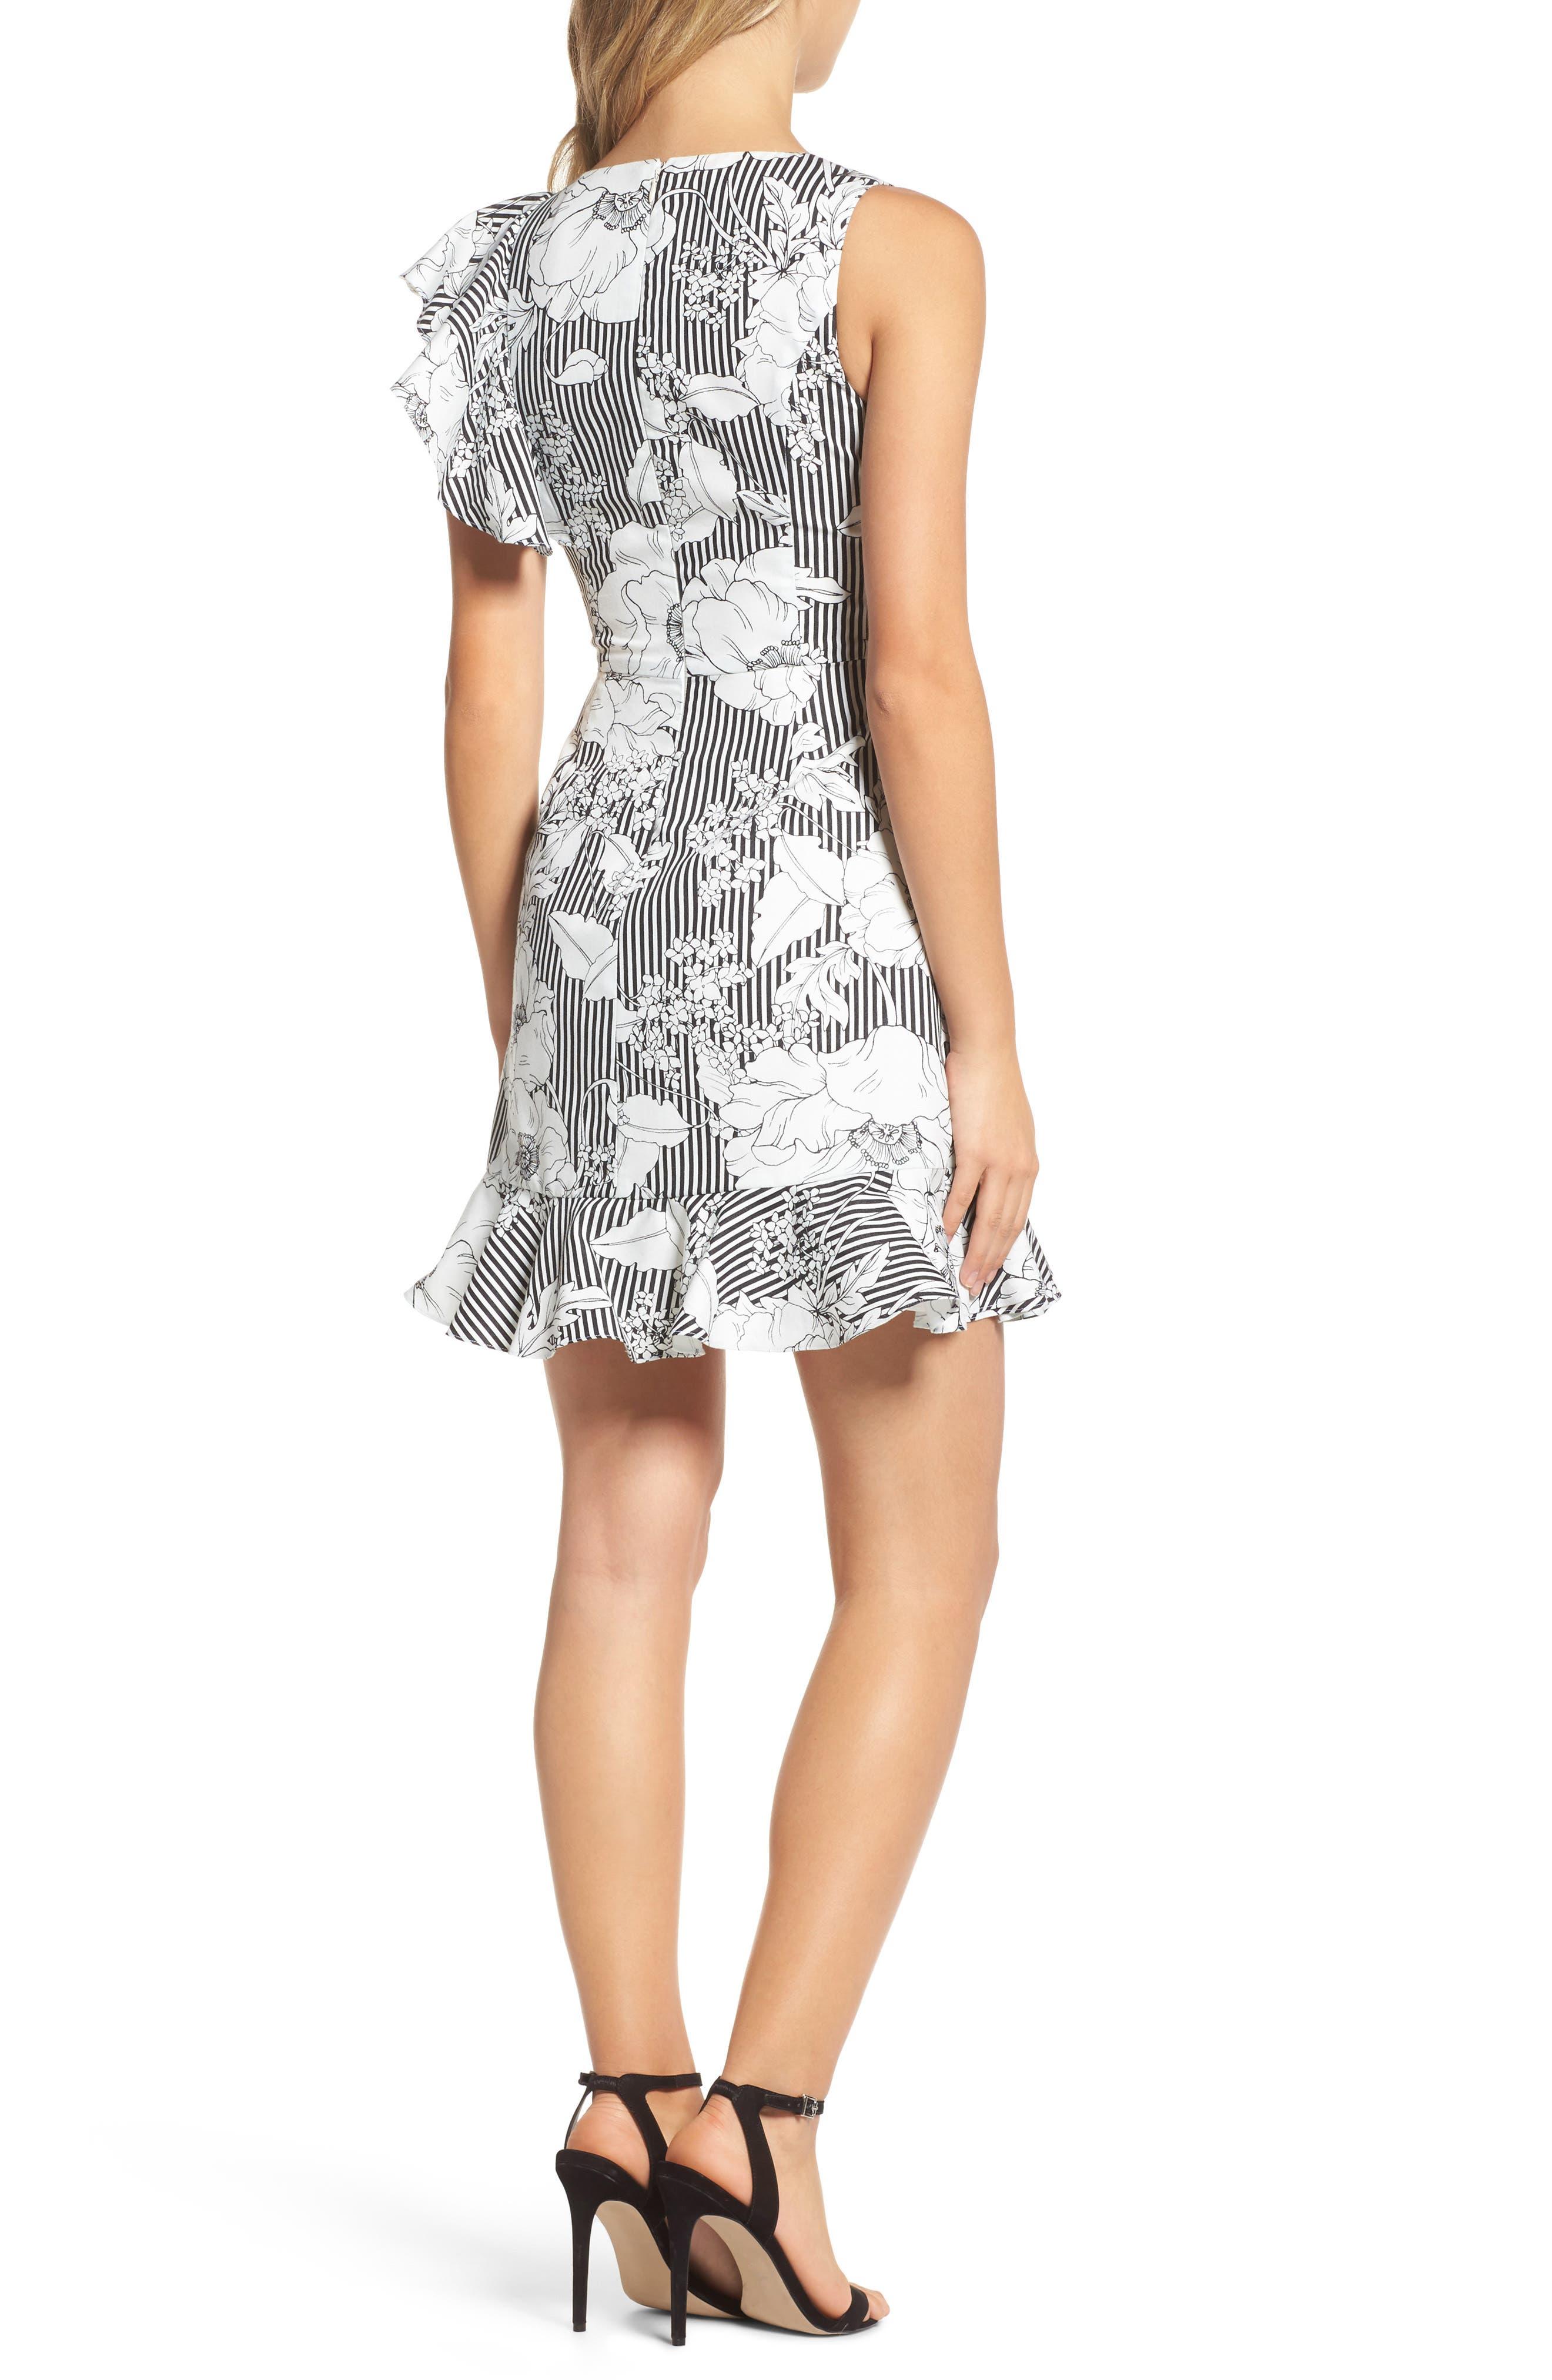 Floral Asymmetrical Ruffle Dress,                             Alternate thumbnail 2, color,                             Black White Floral